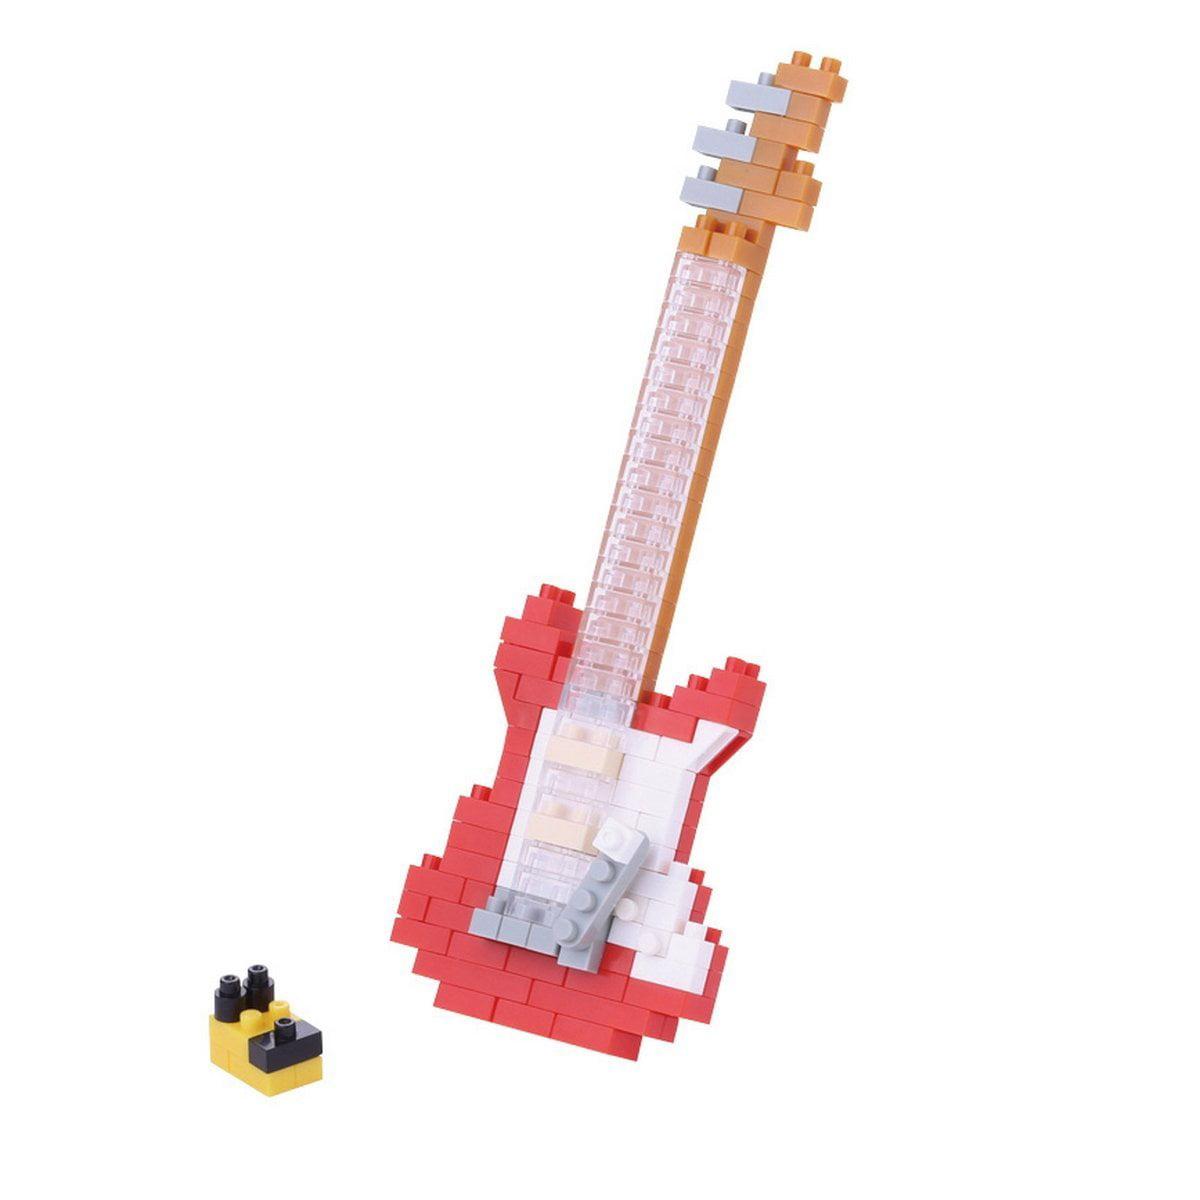 Nanoblock NBC-171 Electric Guitar Micro Block Miniature Collection Puzzle (160 Piece),... by